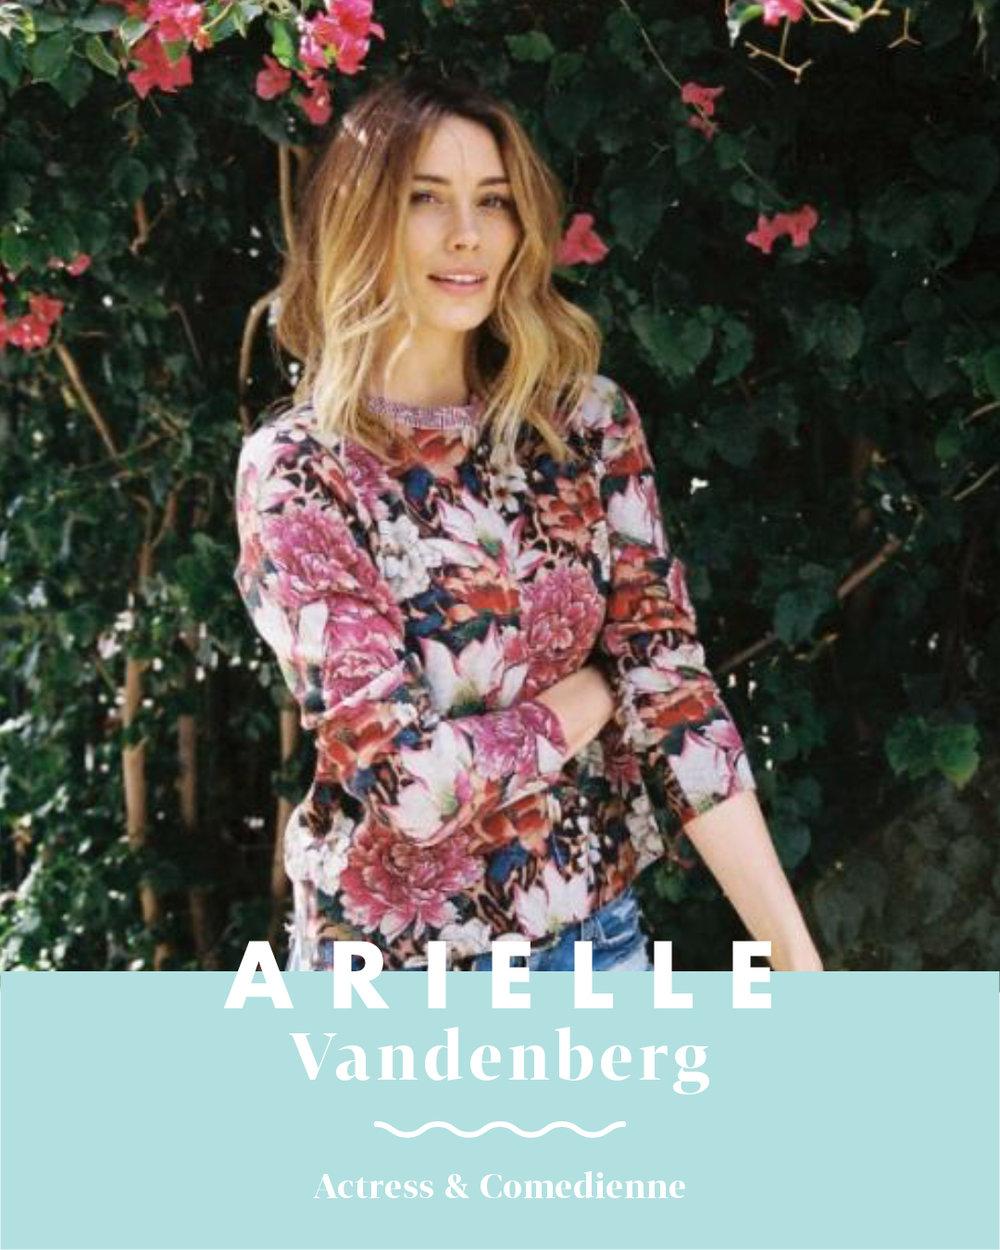 arielle-vandenberg.jpg